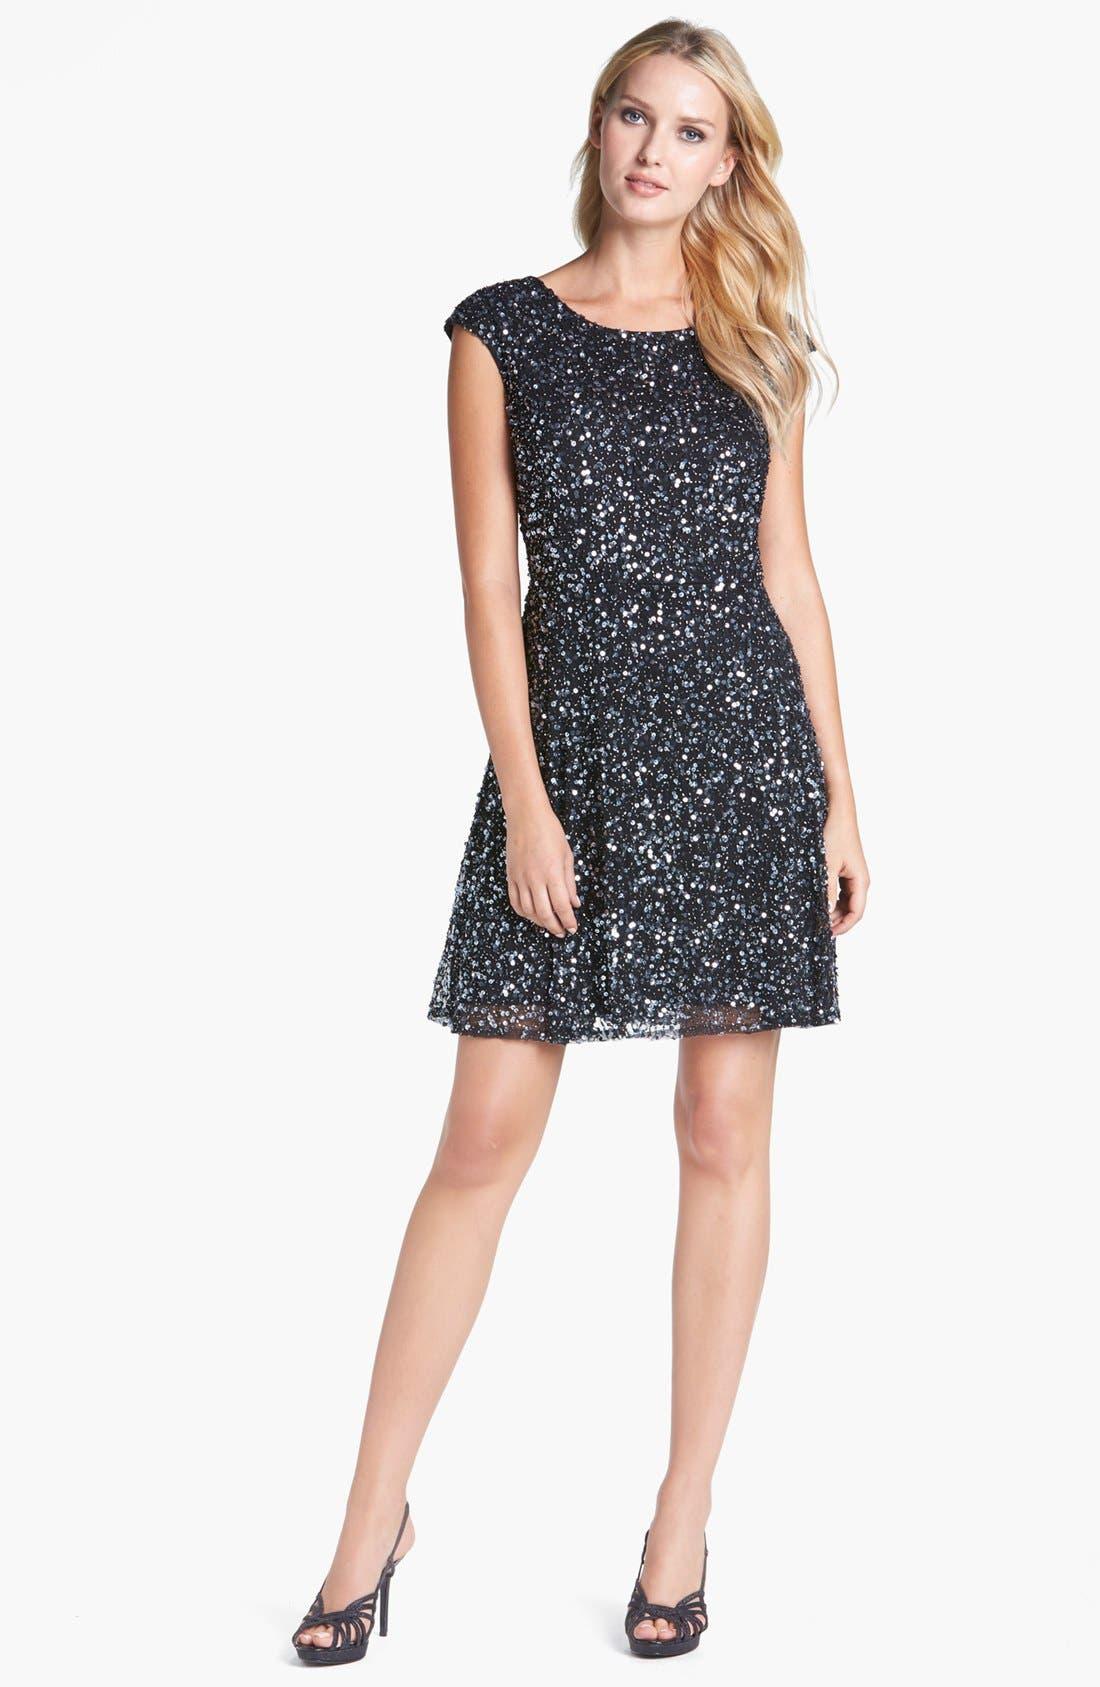 Alternate Image 1 Selected - Pisarro Nights Sequin Fit & Flare Dress